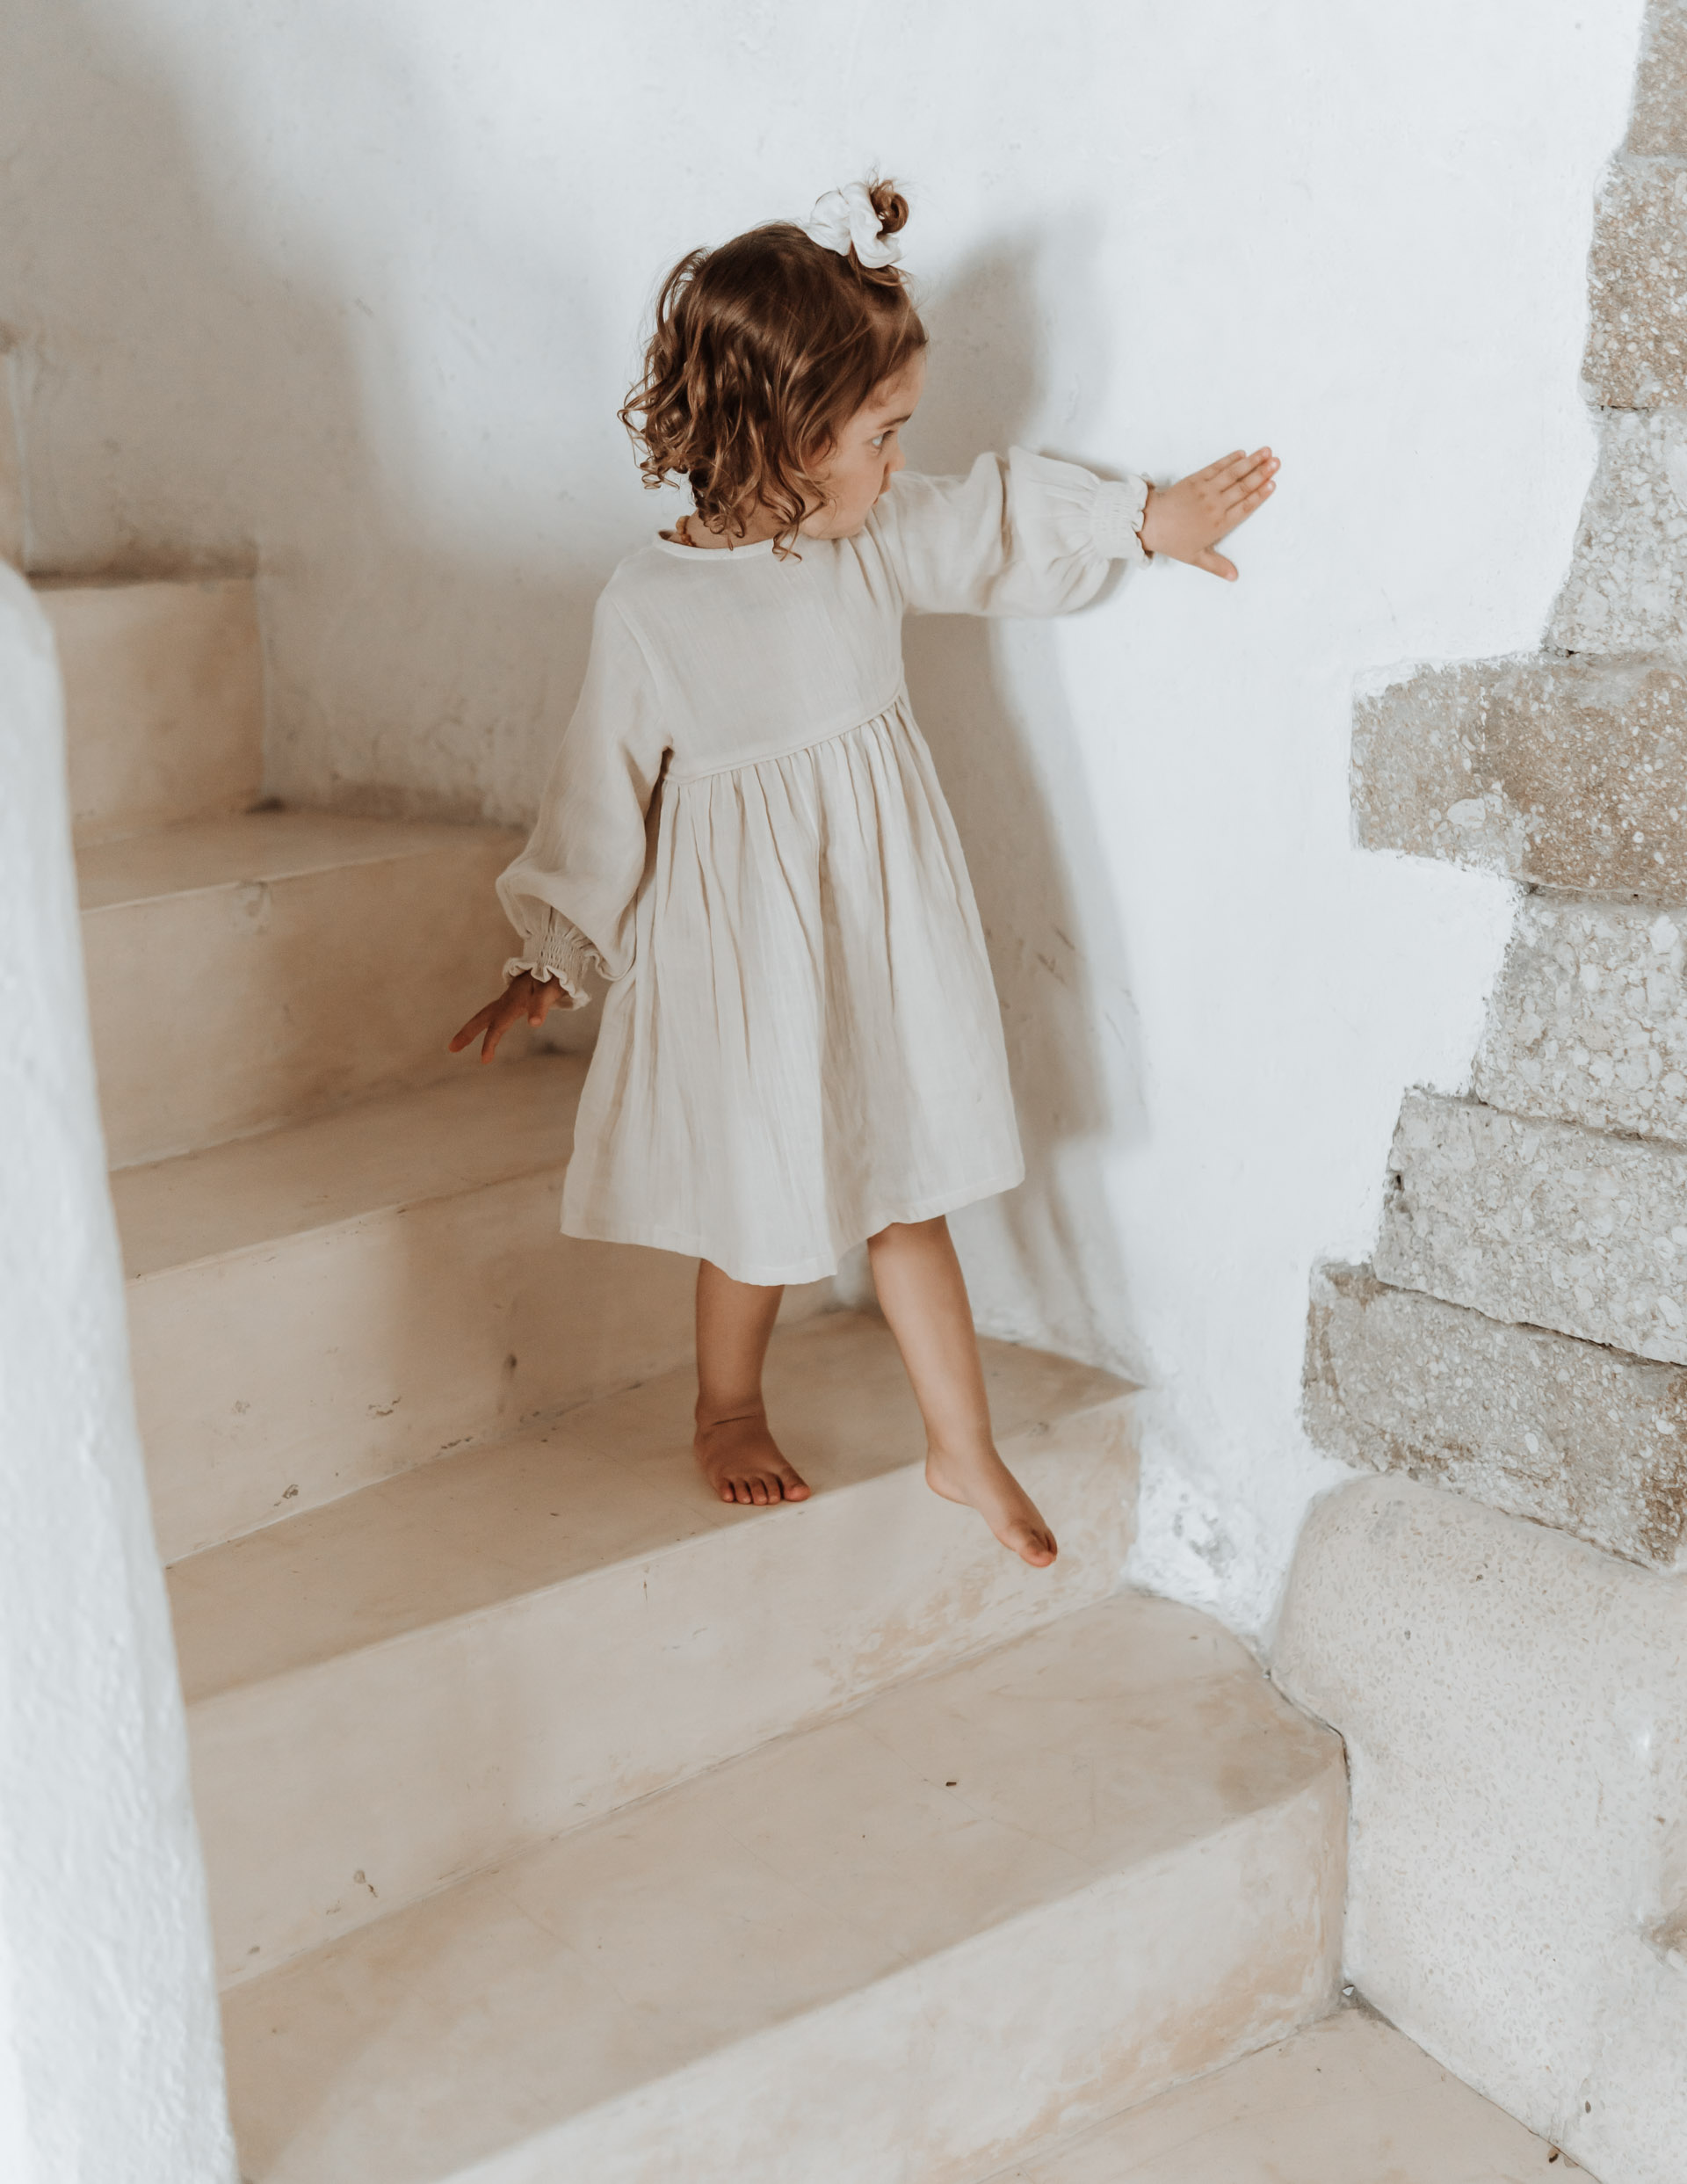 keira-mason-illoura-the-label-girl-walking-down-stairs.jpg